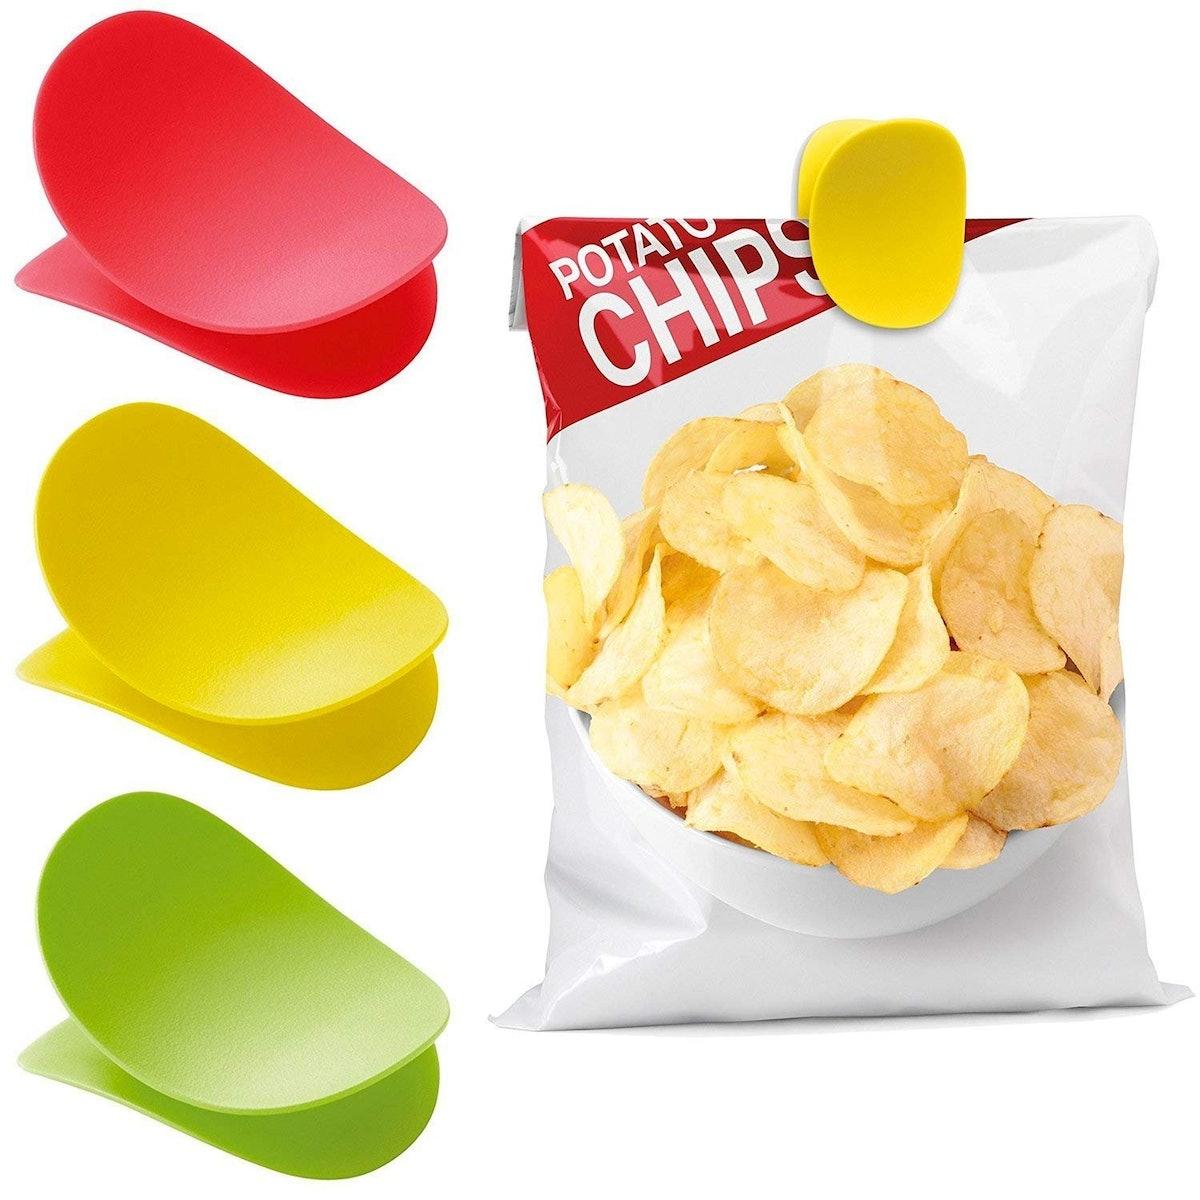 New Soda Chips Bag Clips (3 Pack)